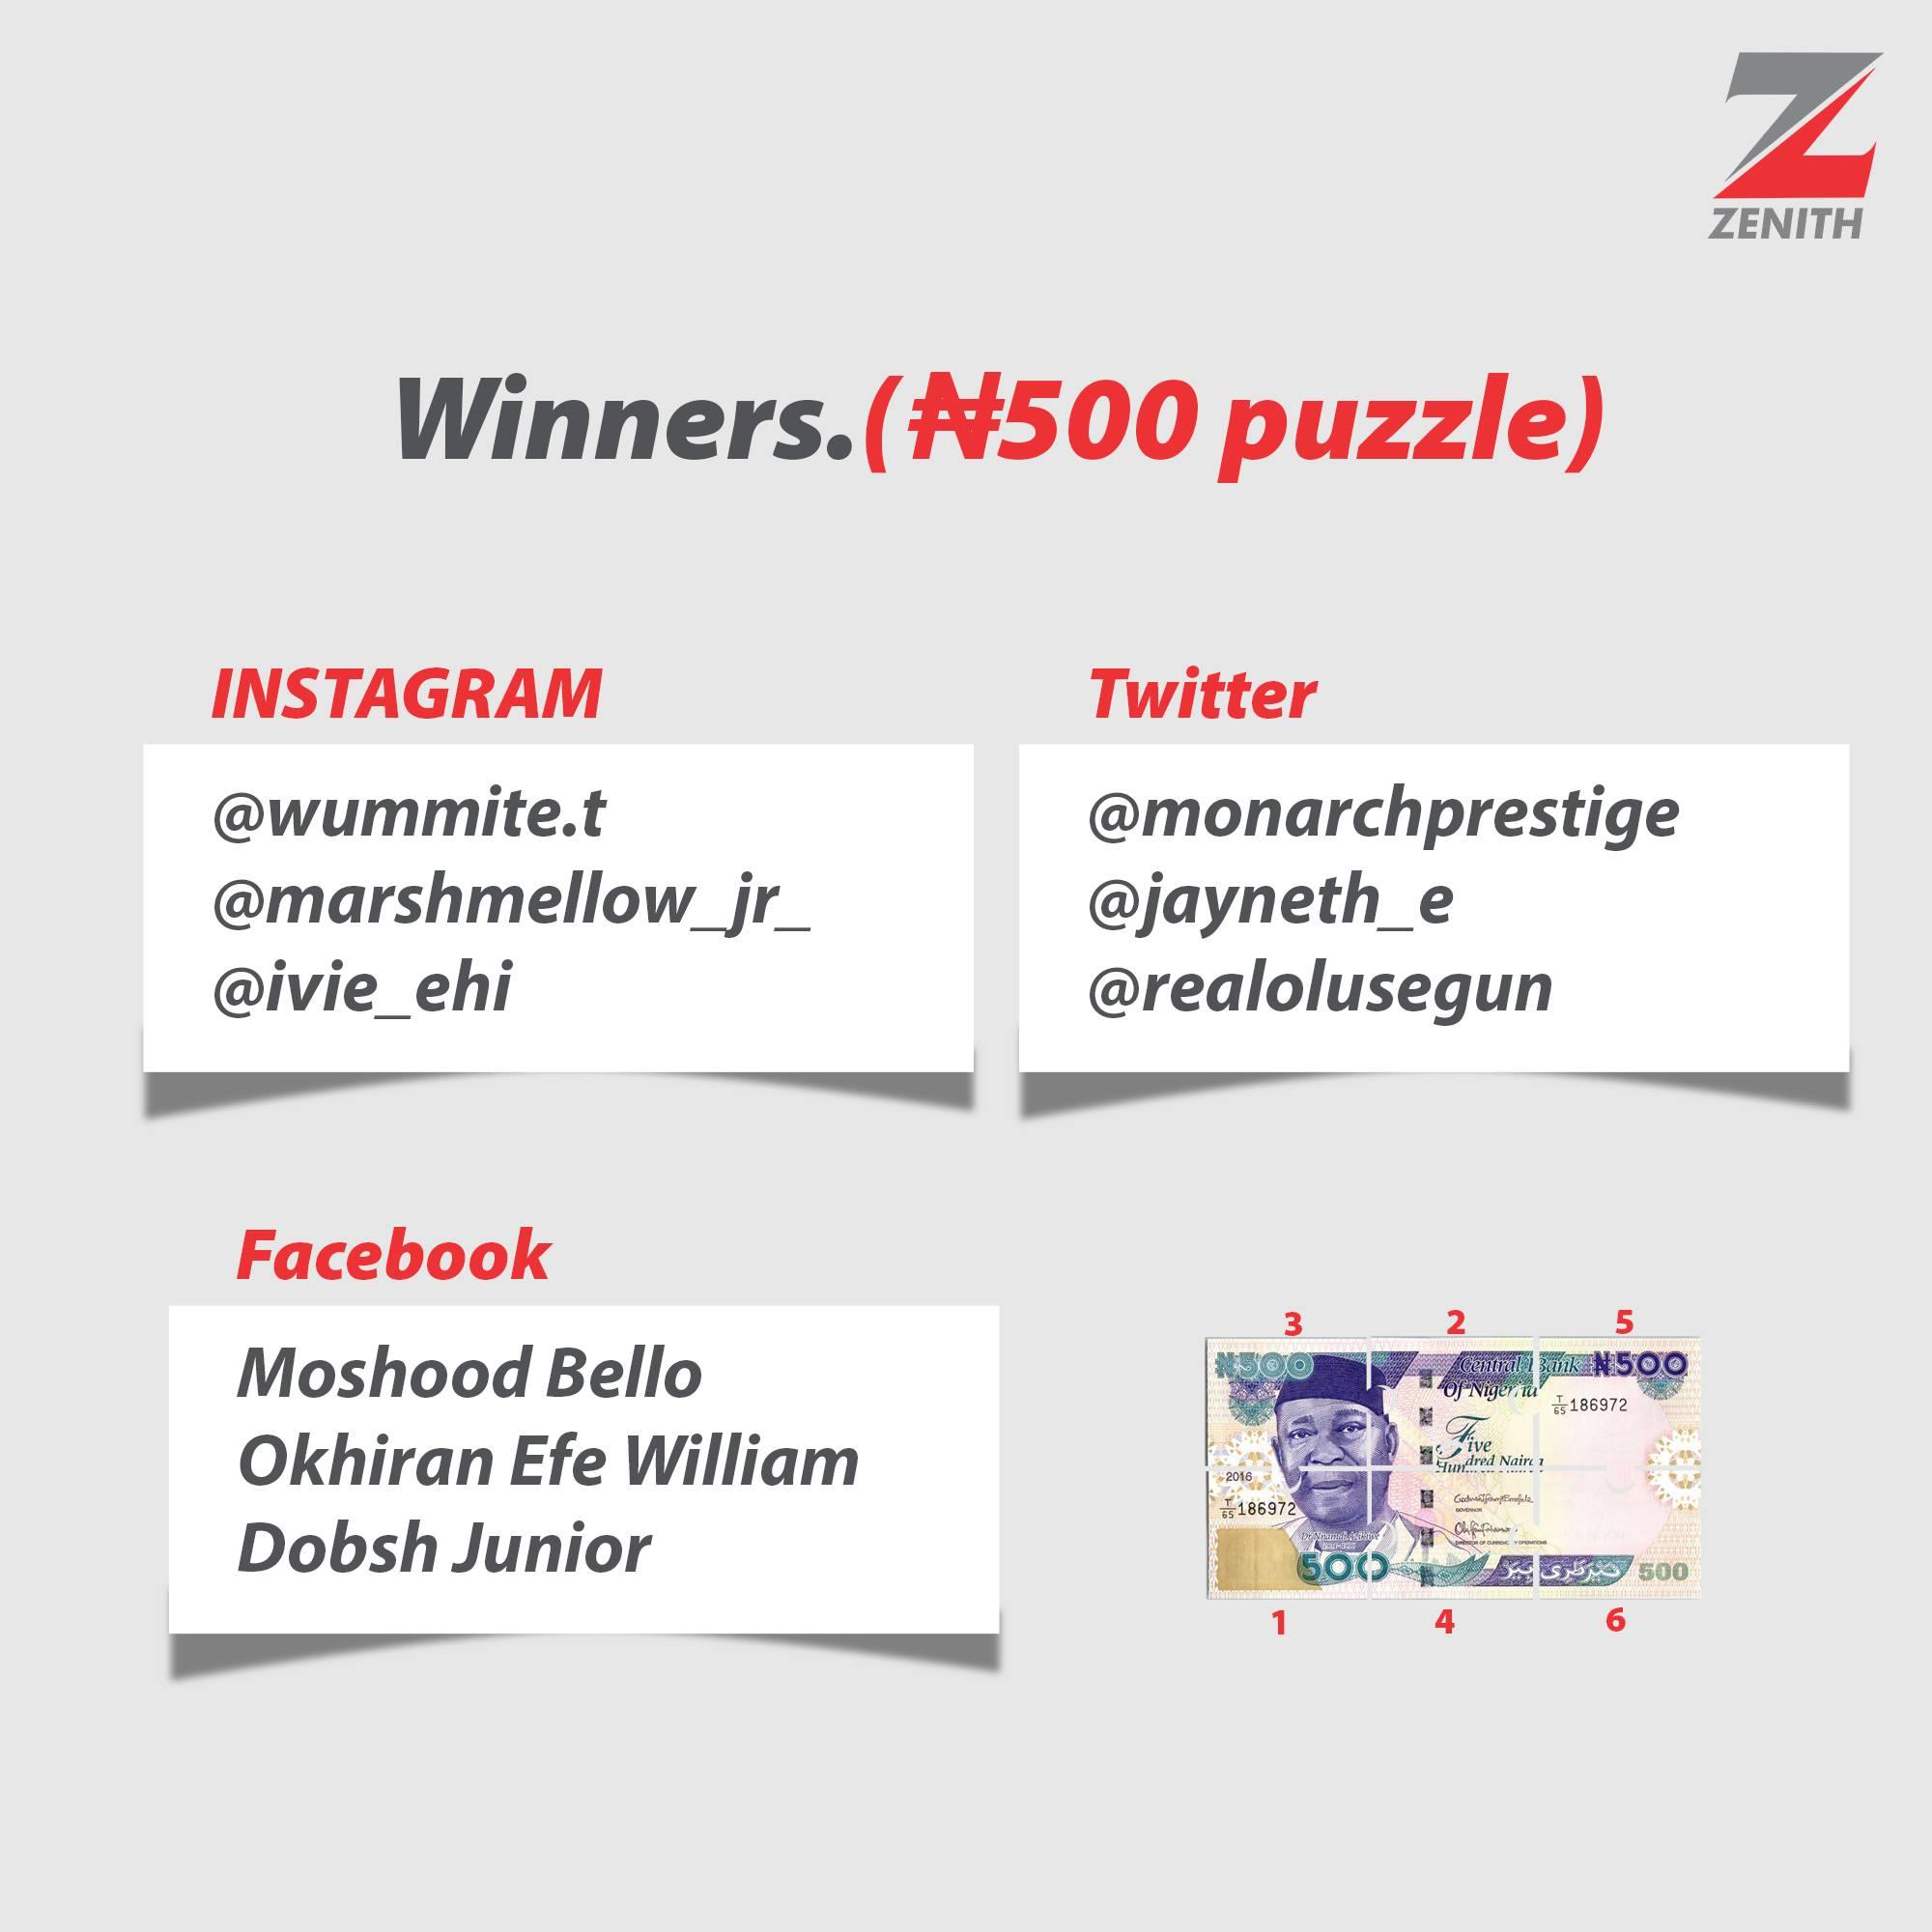 See The Winners of #ZenithDemocracyWeekTrivia.